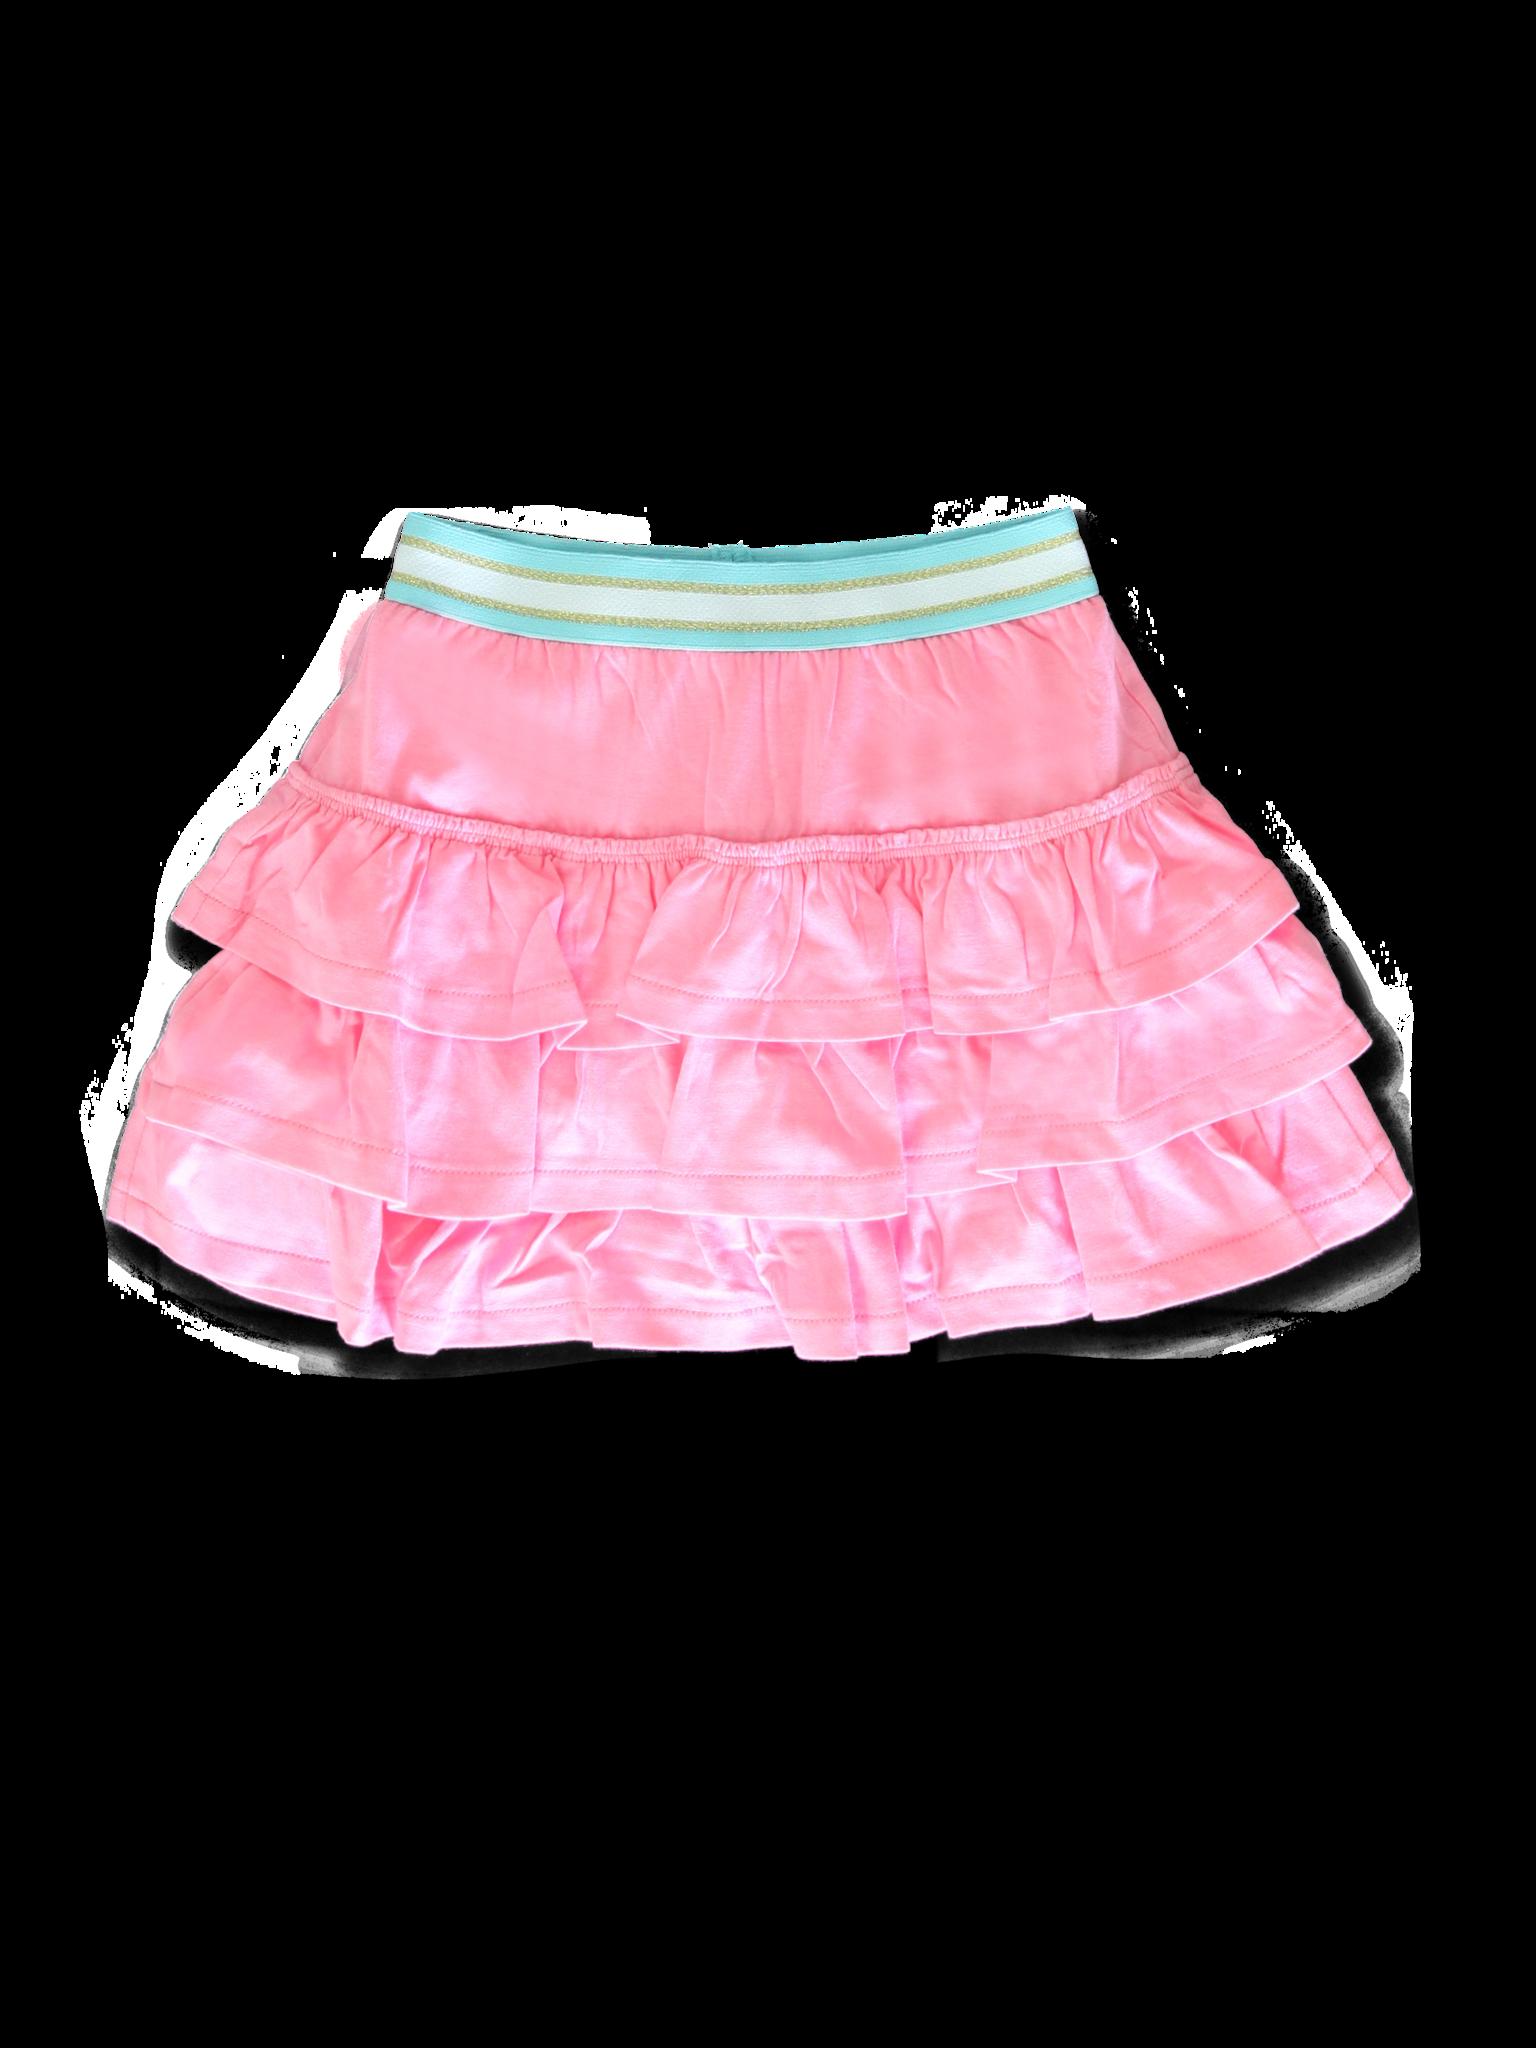 All Brands | Summerproducts Small Girls | Skirt | 12 pcs/box